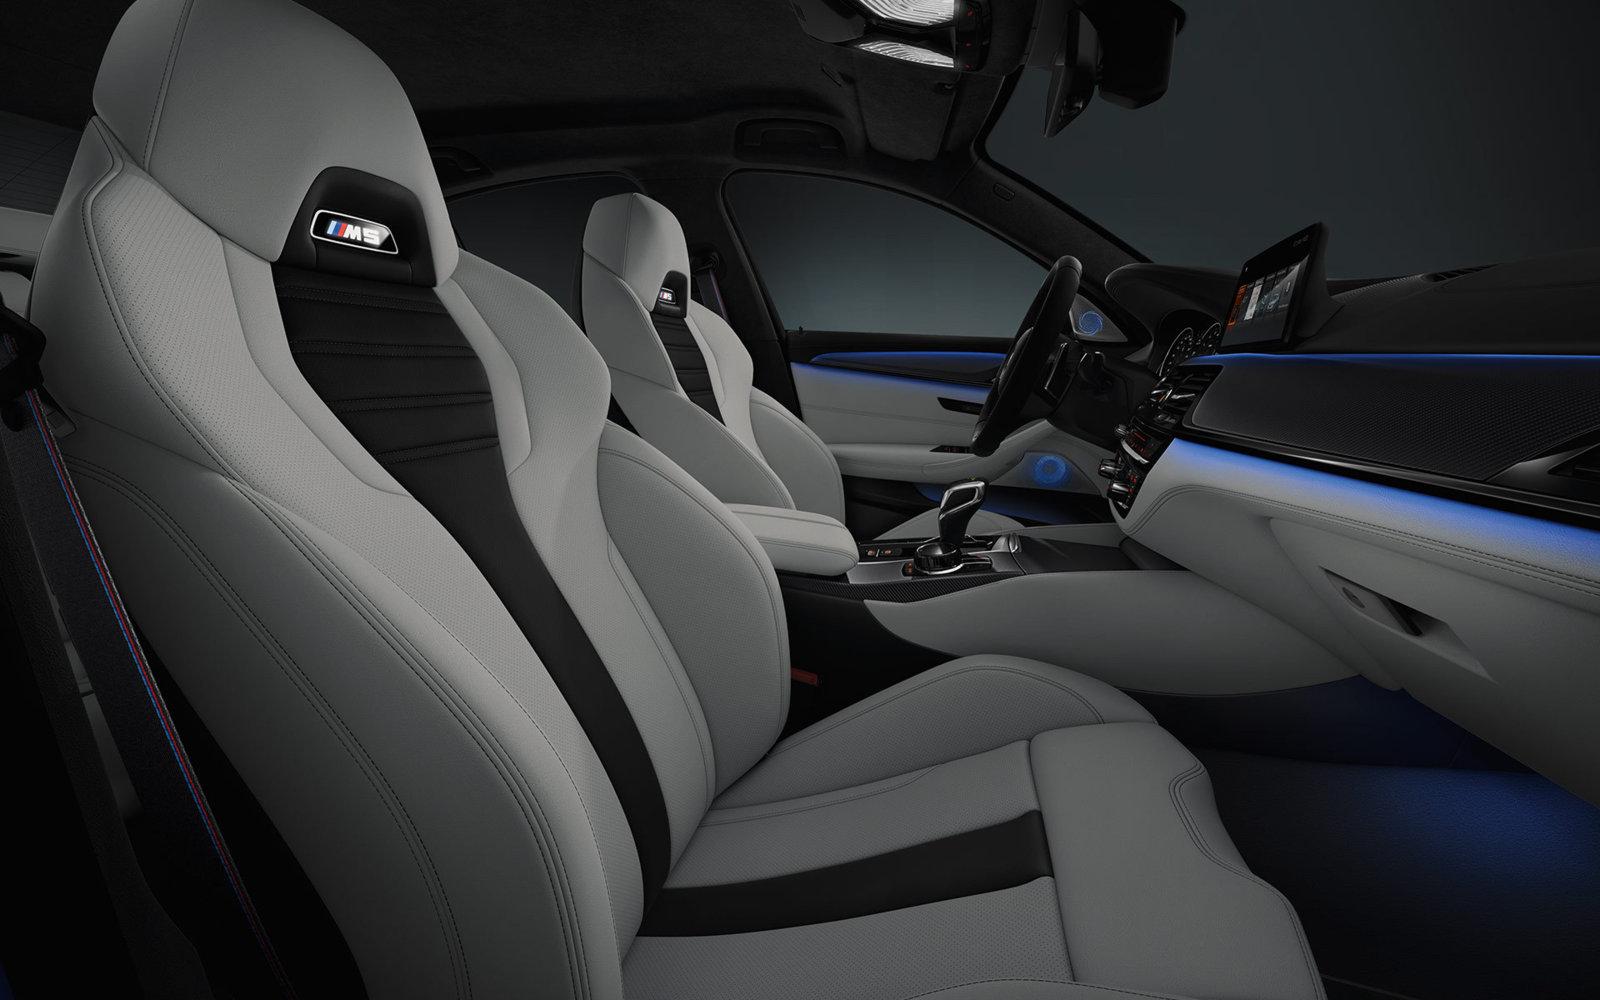 BMW-M5-2018-Wallpaper-11.jpg